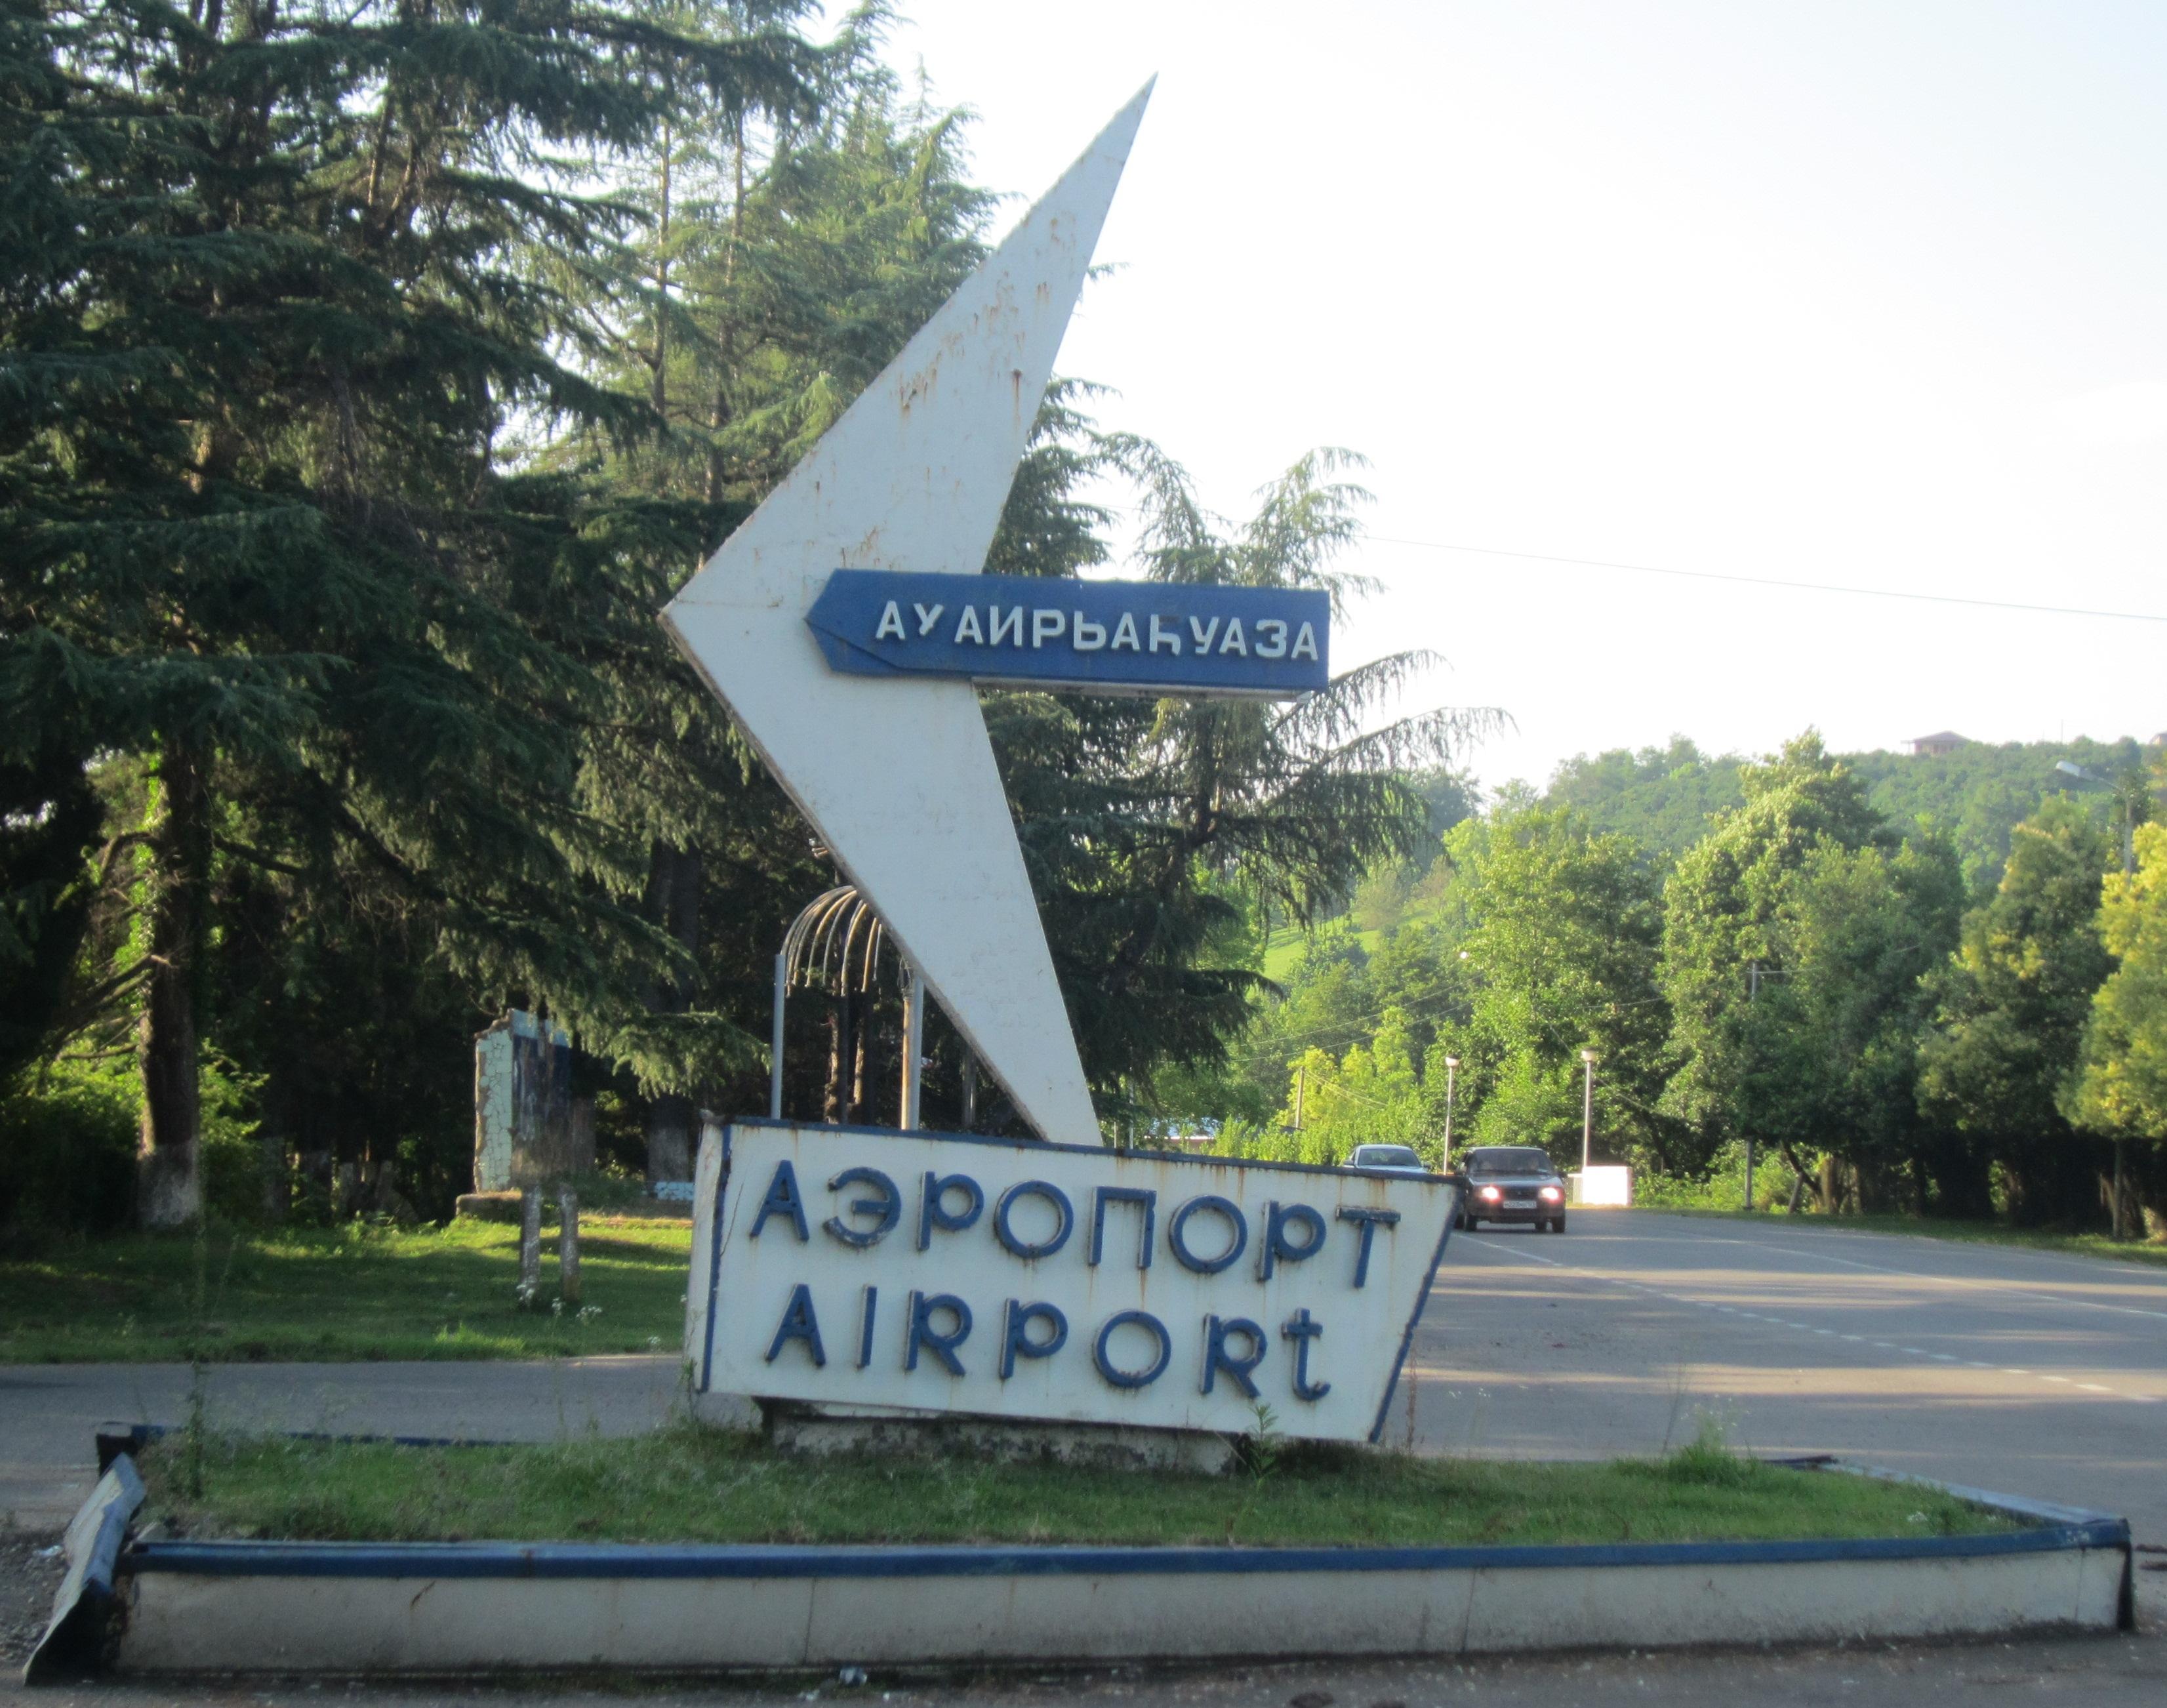 Suhumi aeroport #новости Абхазия, Аэропорт Сухуми, Сухуми, Хаджимба